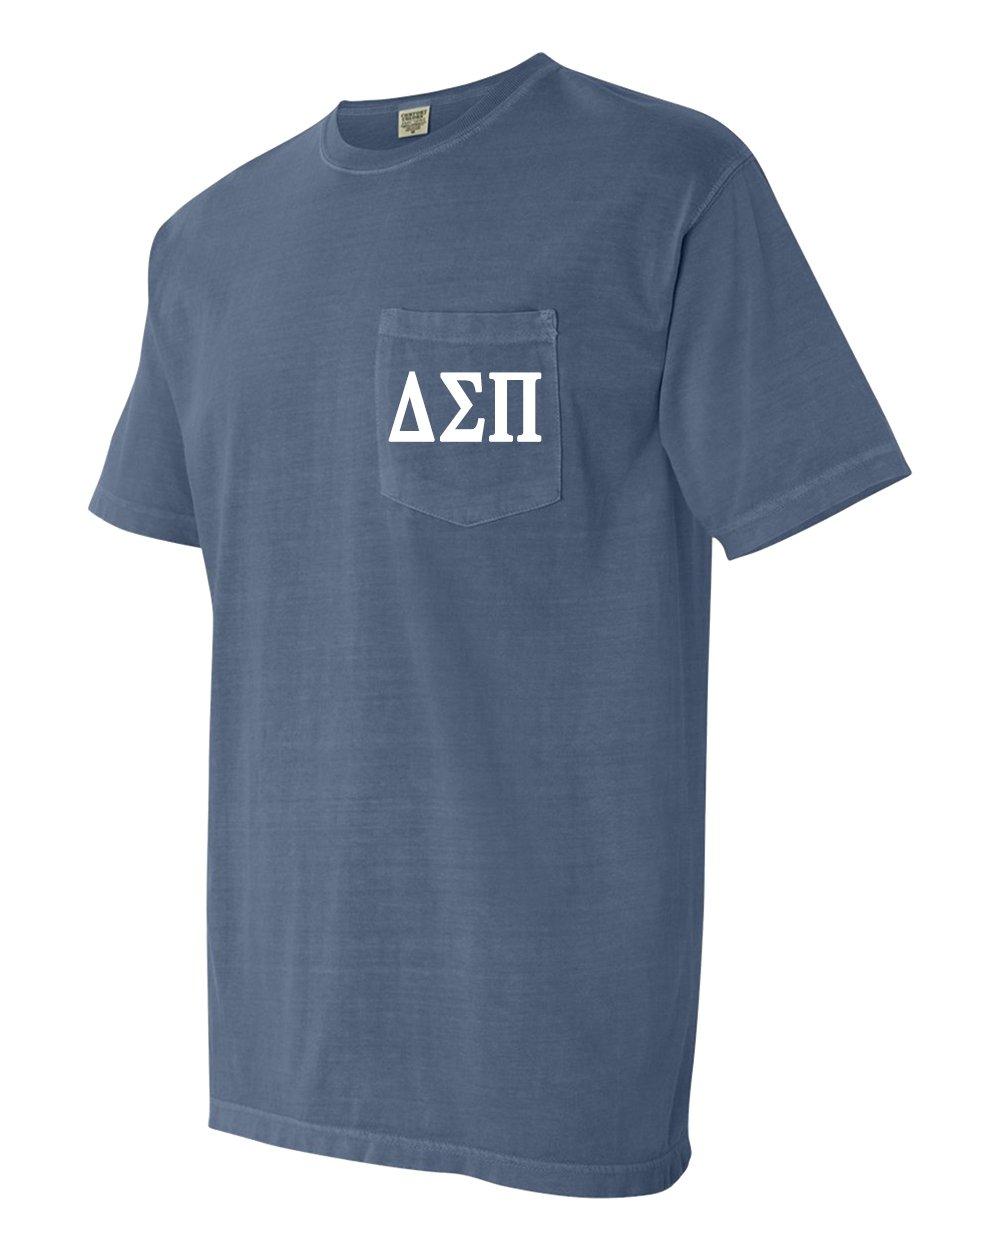 Delta Sigma Pi Business Fraternity Comfort Colors Pocket T-Shirt (Medium, Blue Jean)